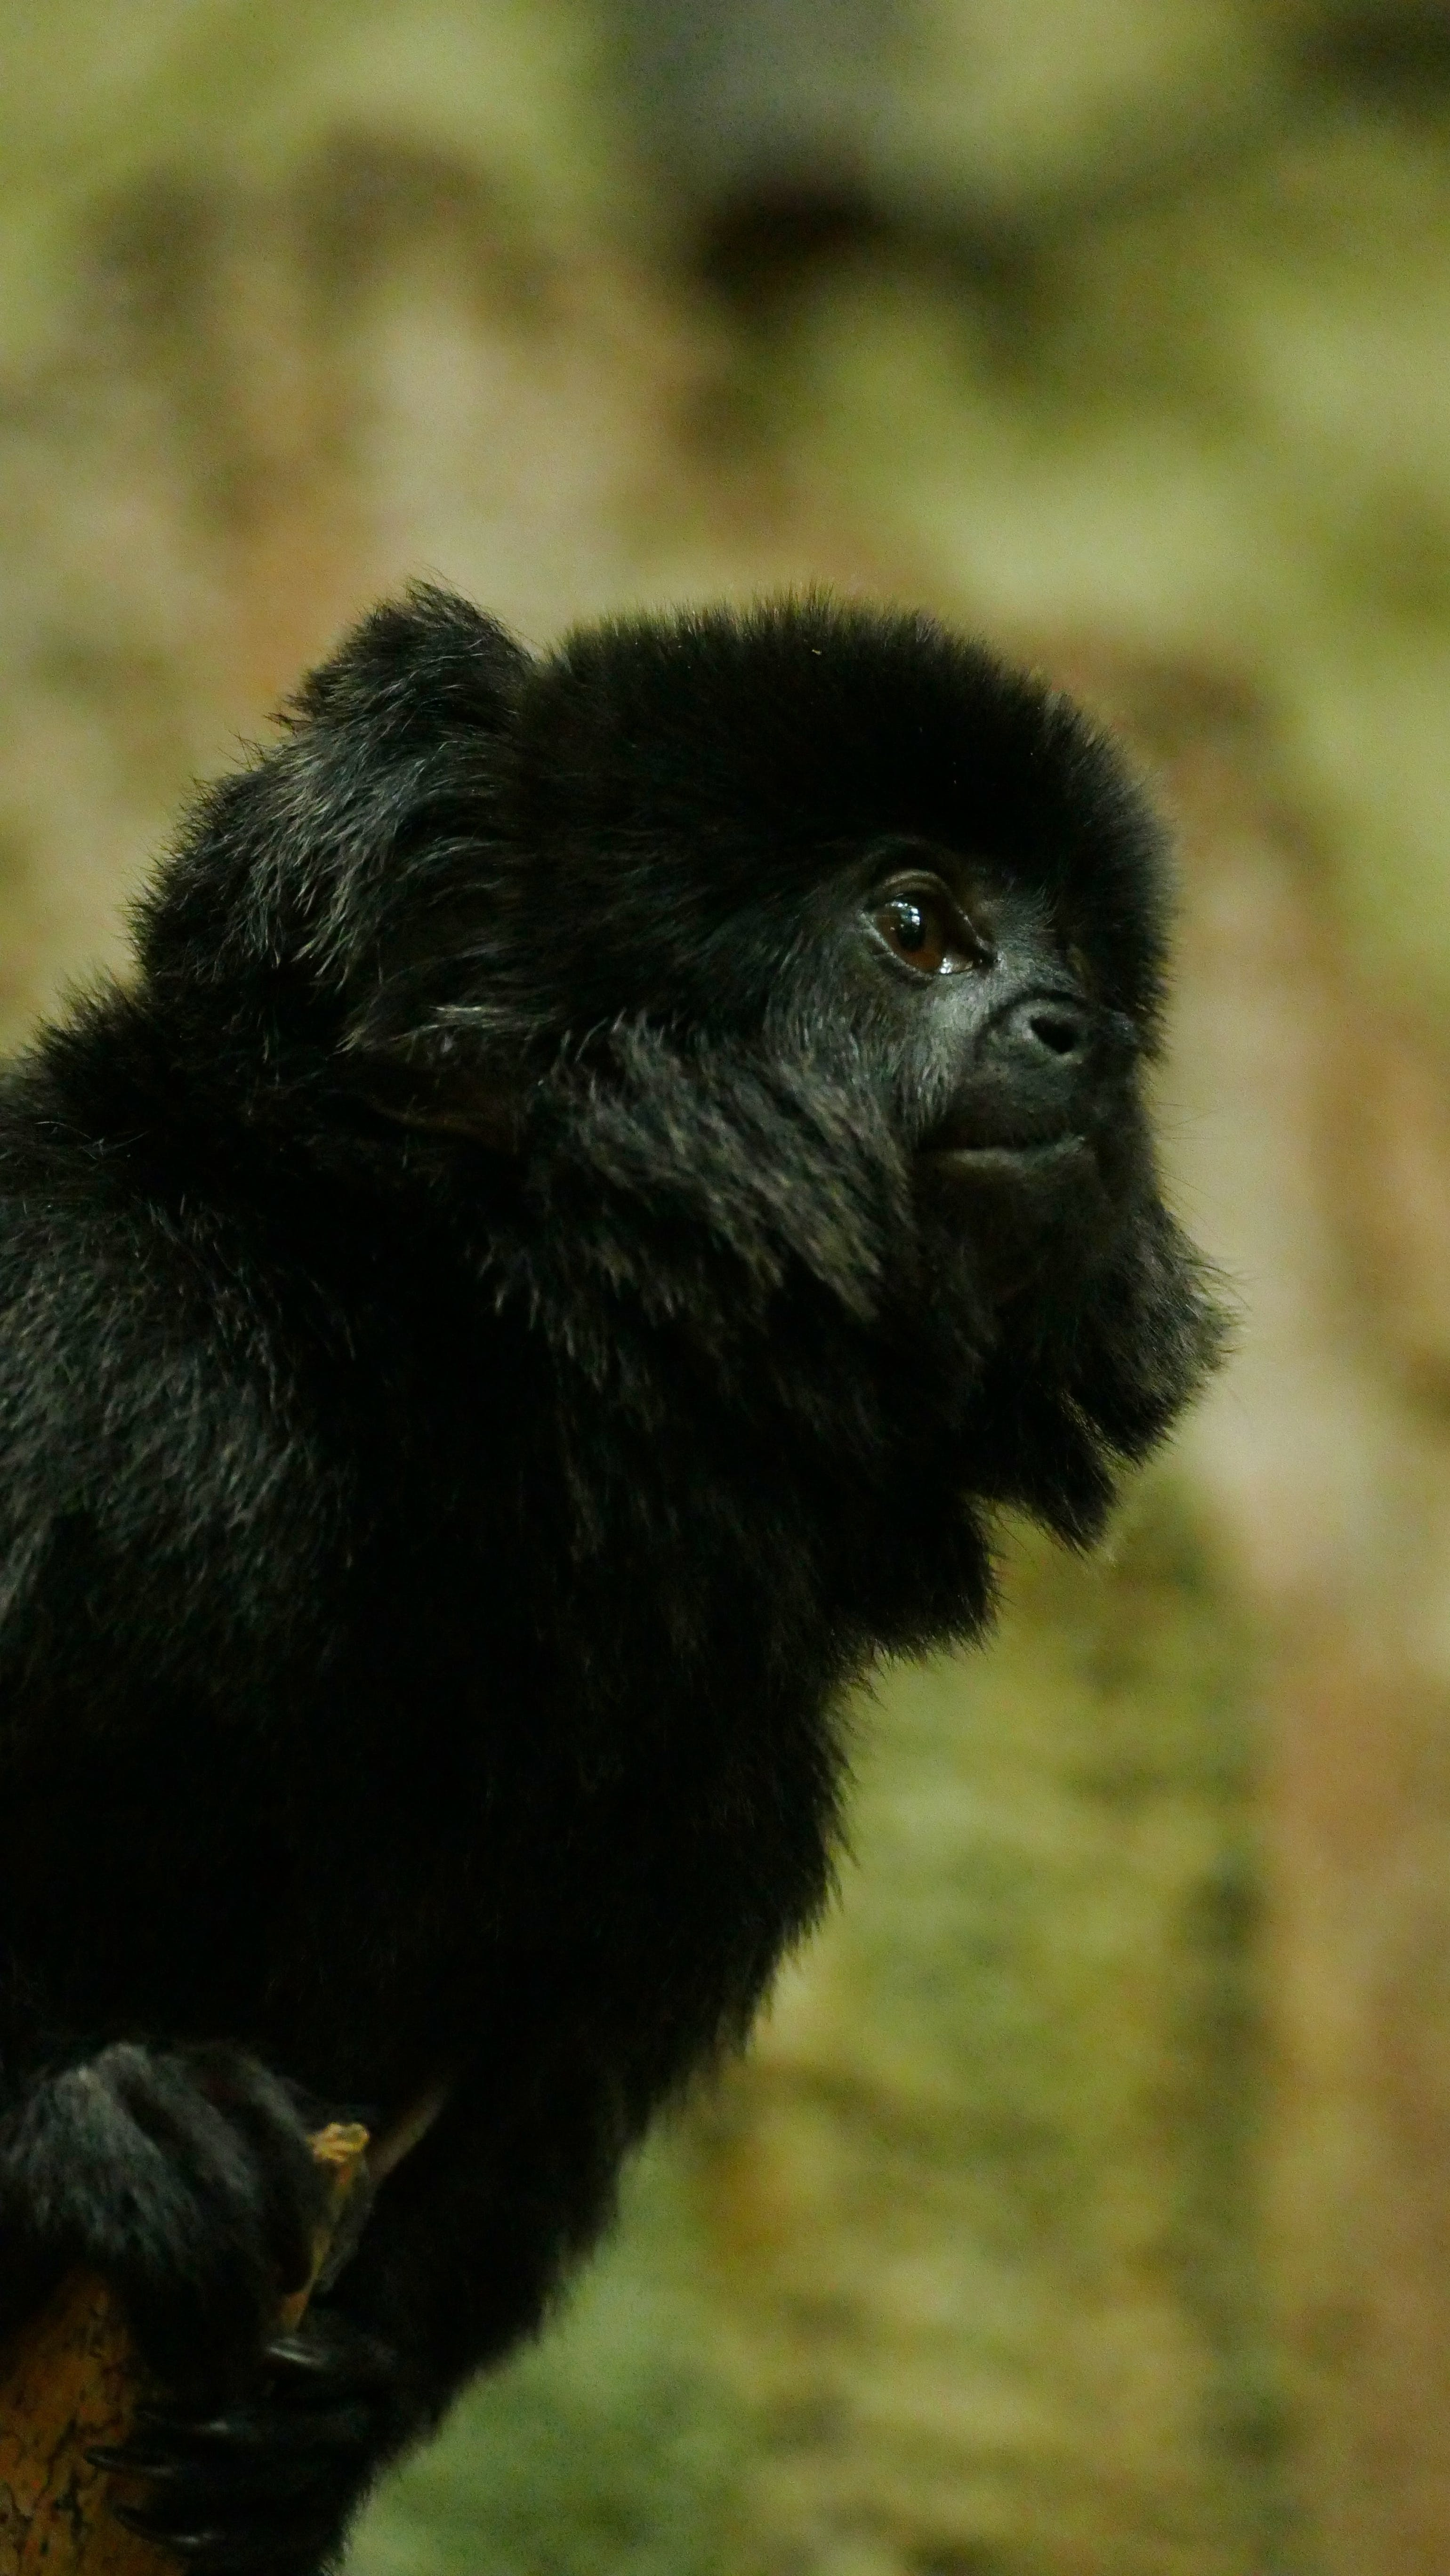 Gratis arkivbilde med apekatt, dyr, dyreliv, primat